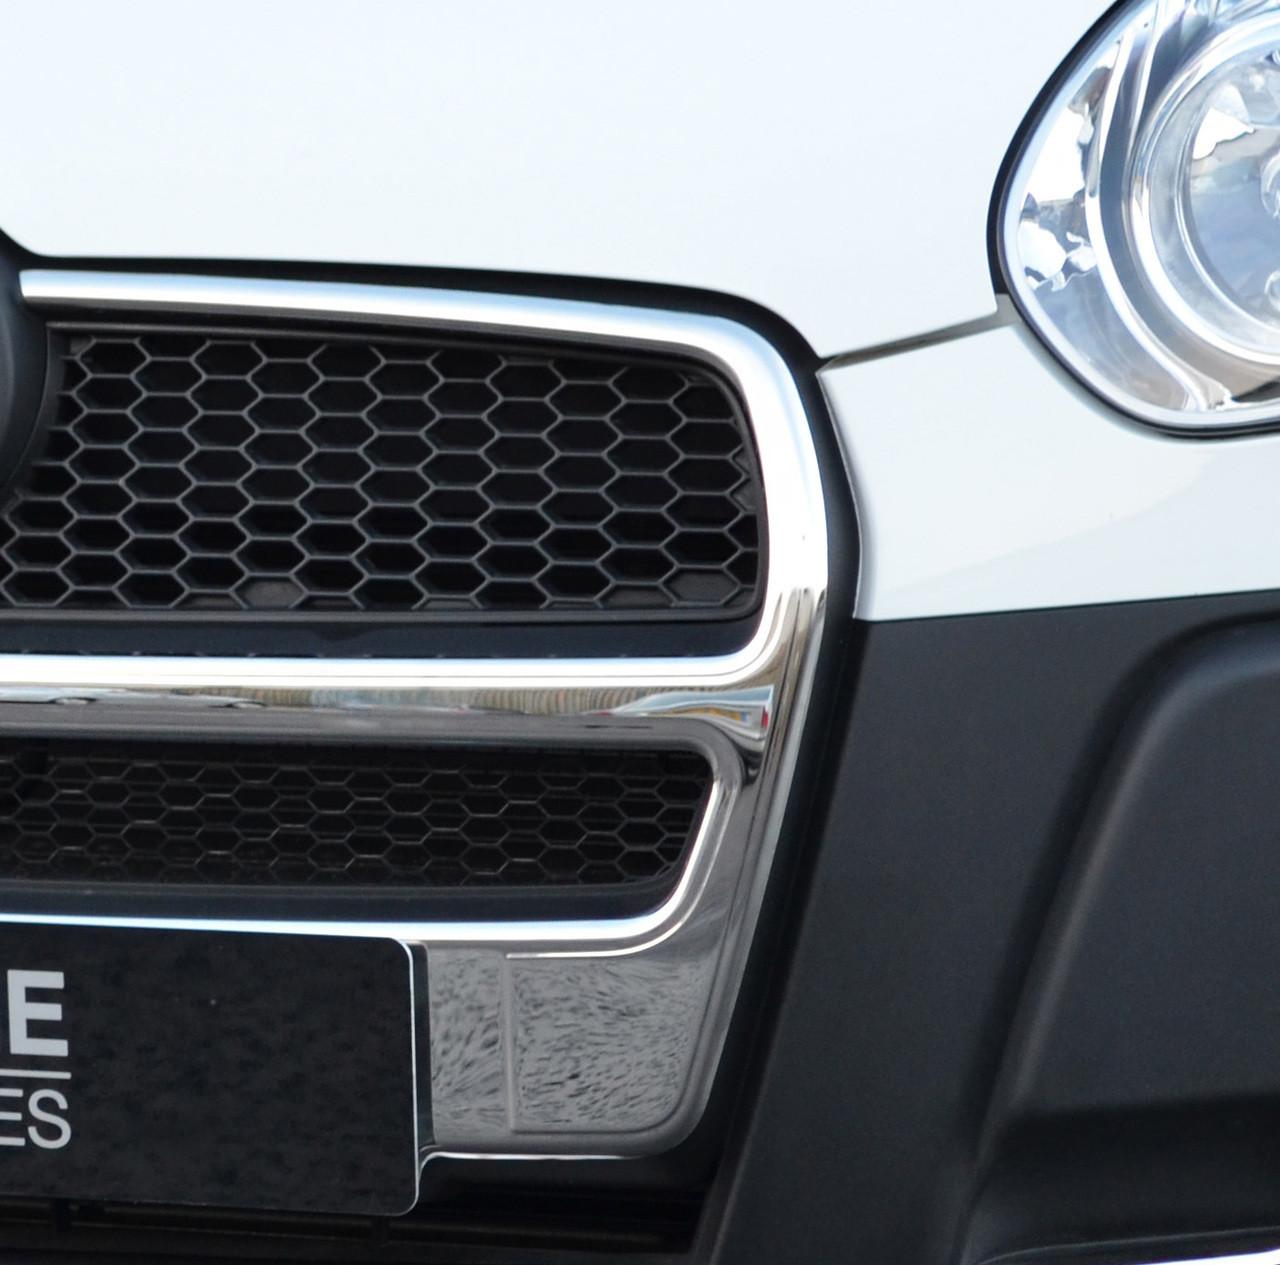 2010+ Chrome Side Door Streamer Trim Set Covers To Fit Fiat Doblo